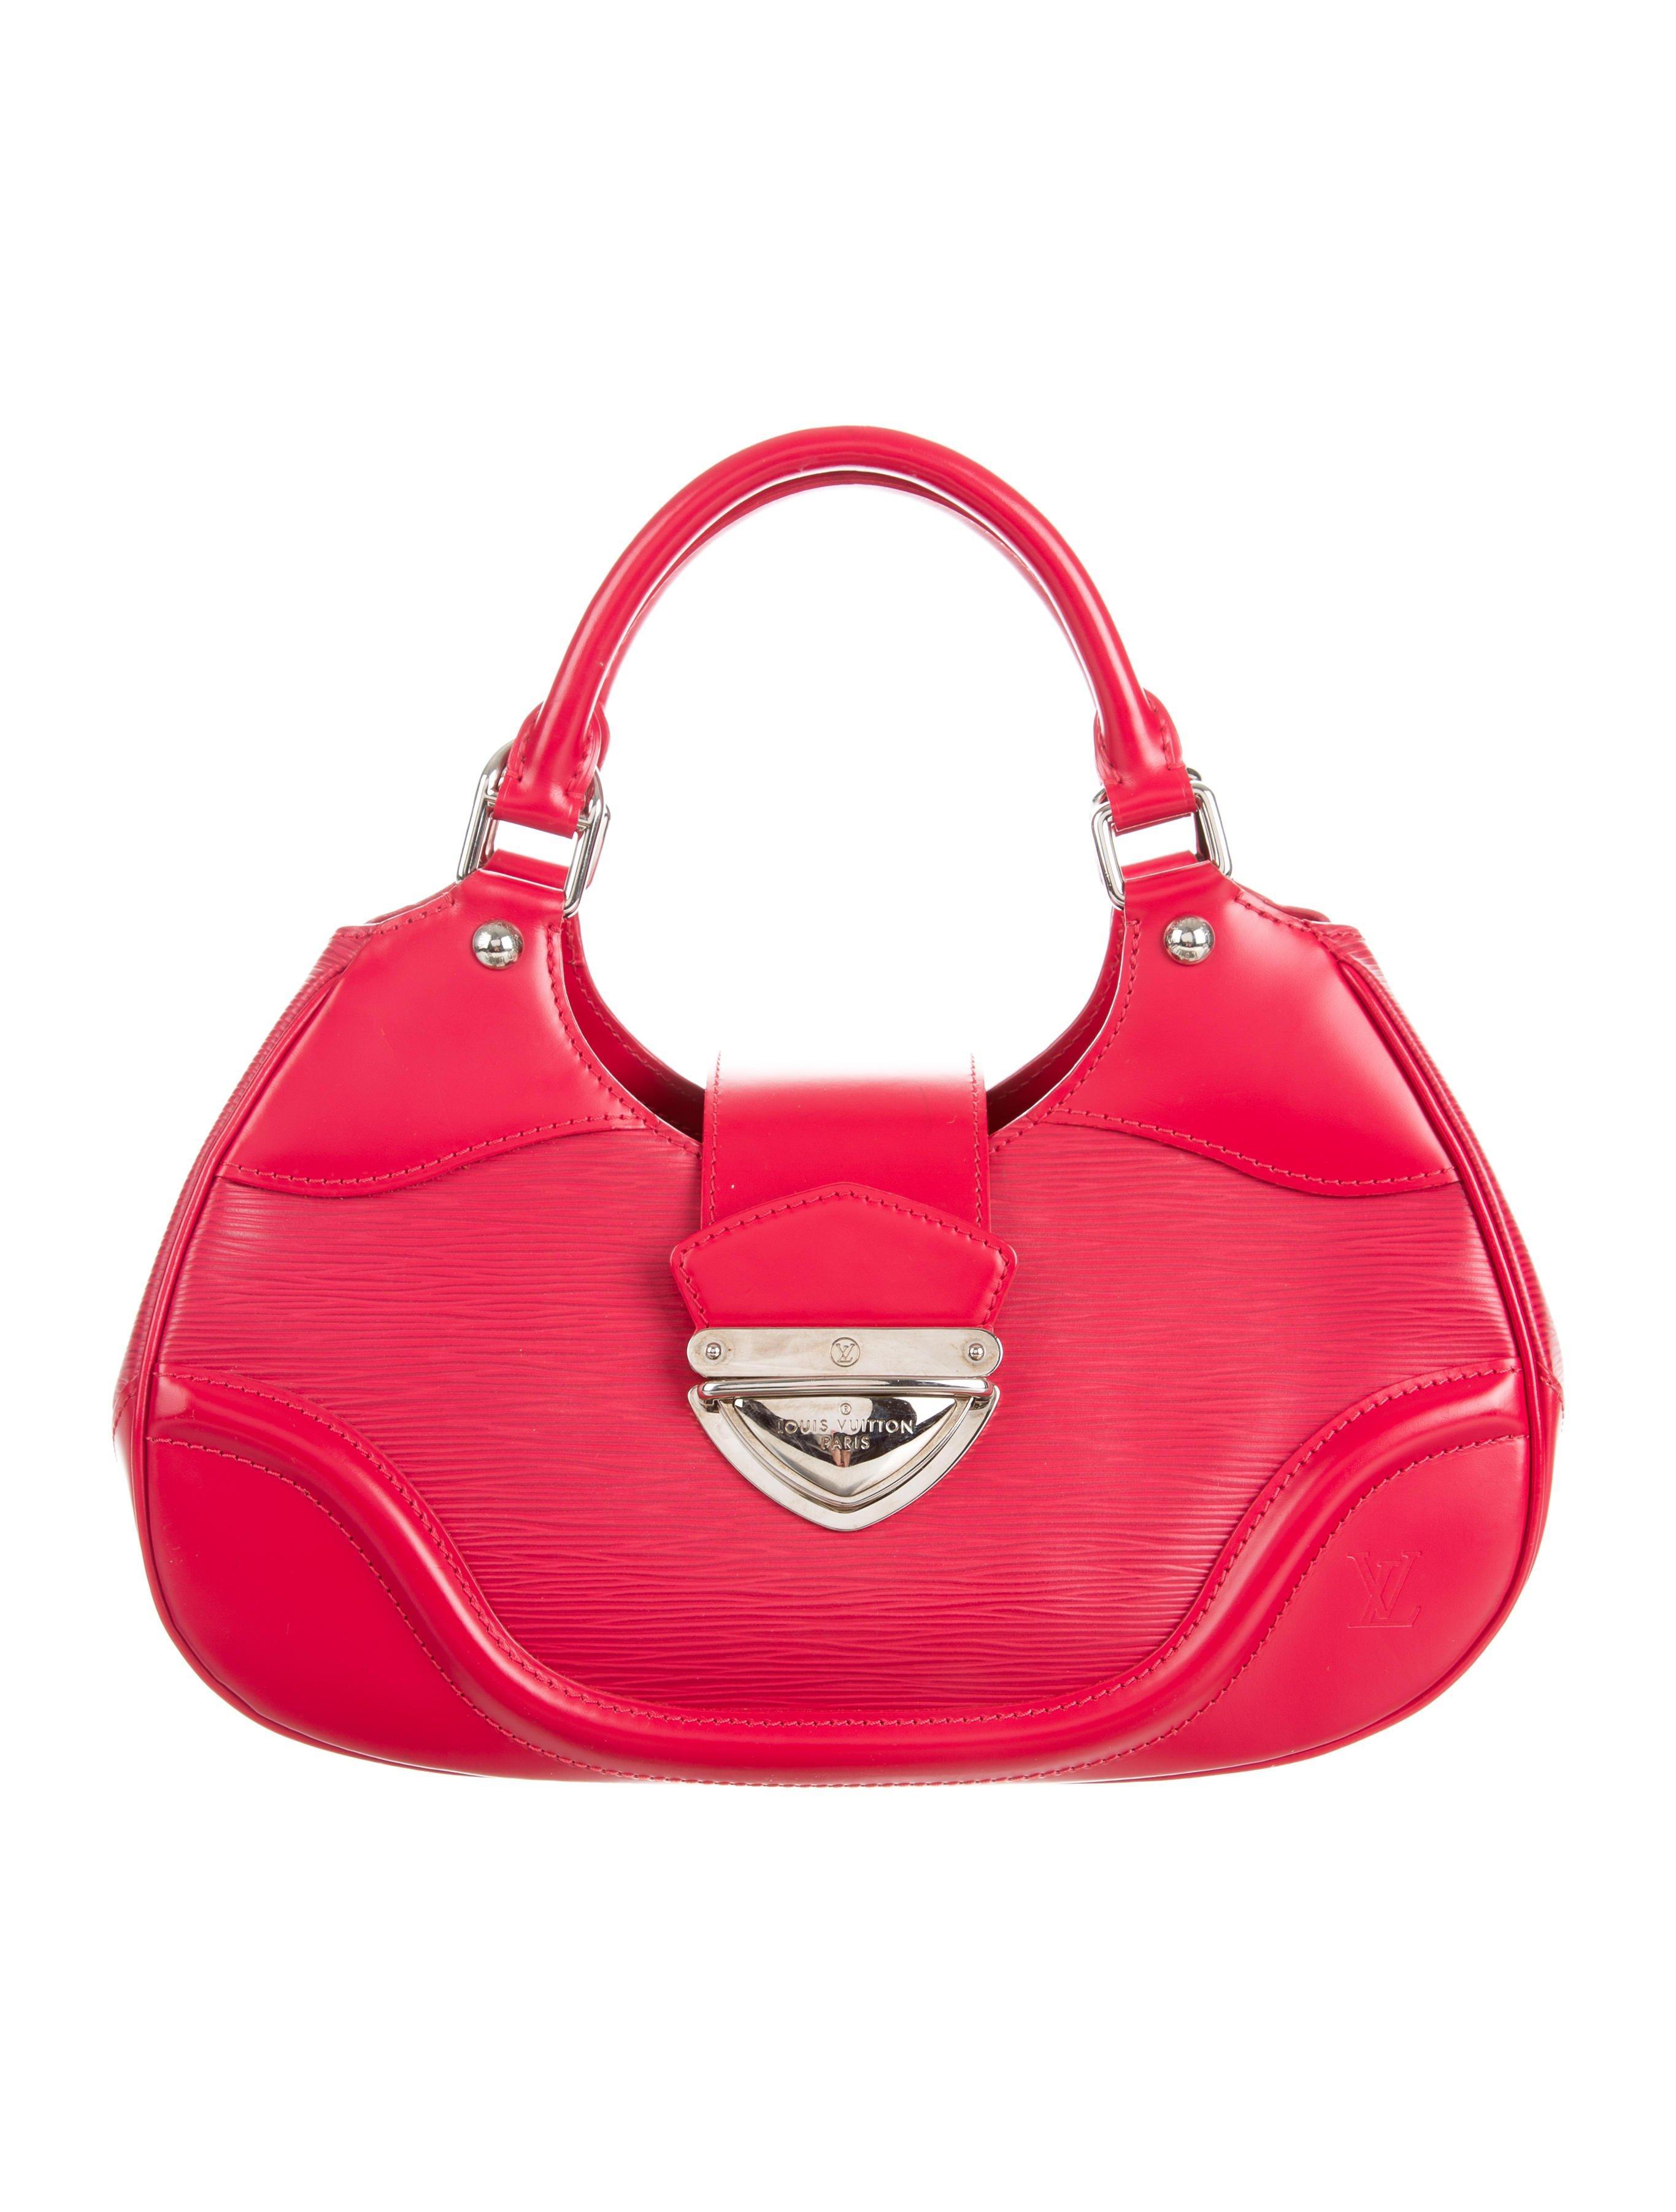 Lyst - Louis Vuitton Epi Sac Montaigne Red in Metallic 19ca457f0f236